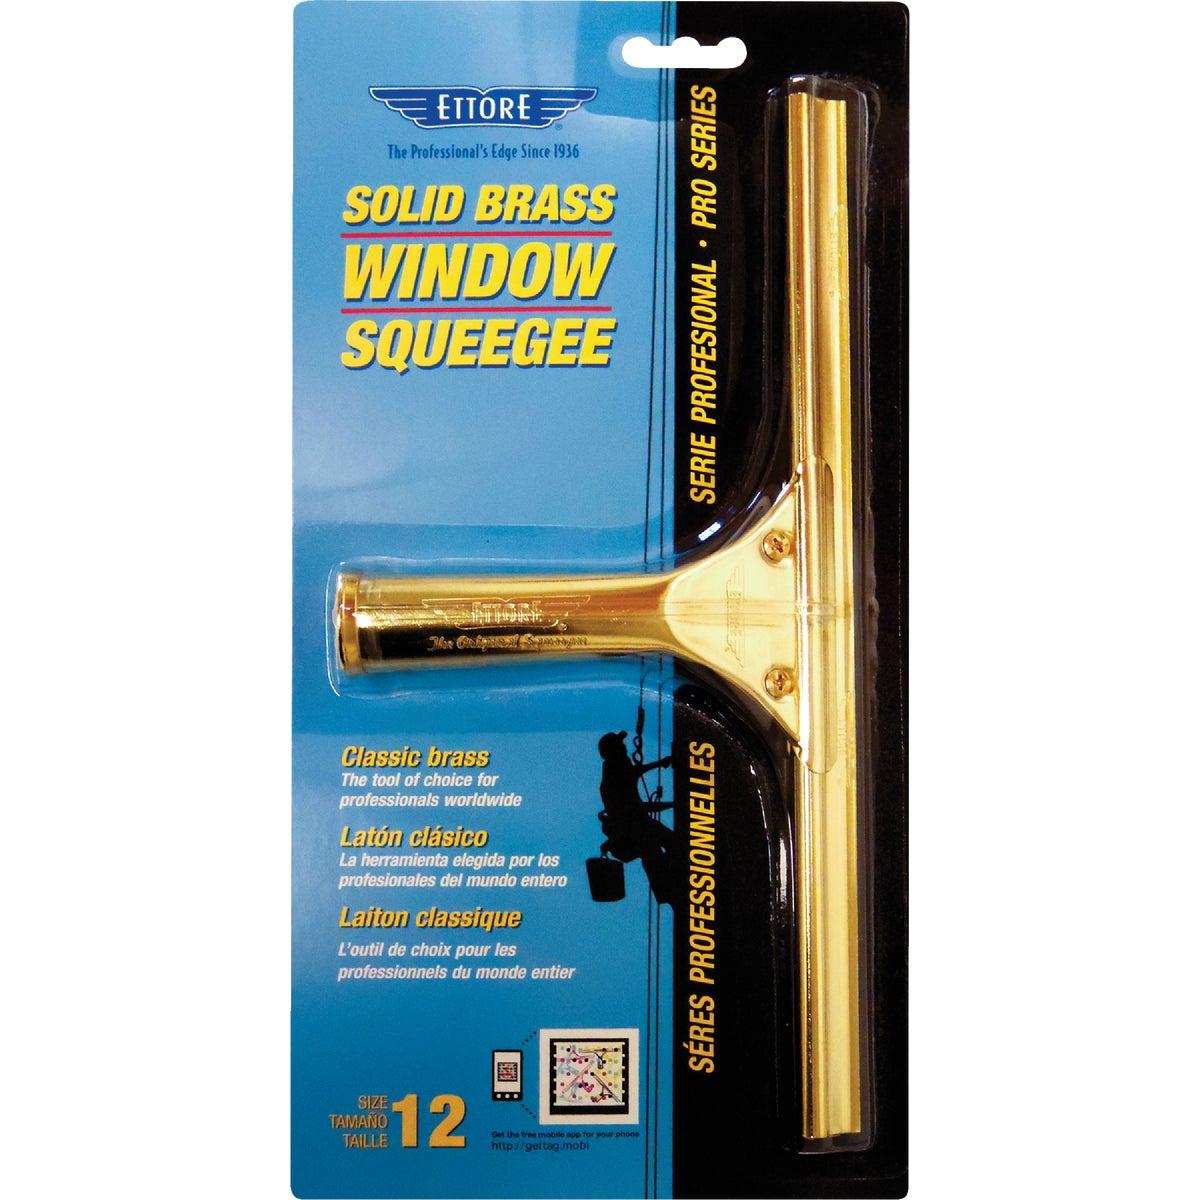 Ettore ProSeries Brass Window Squeegee, 10012